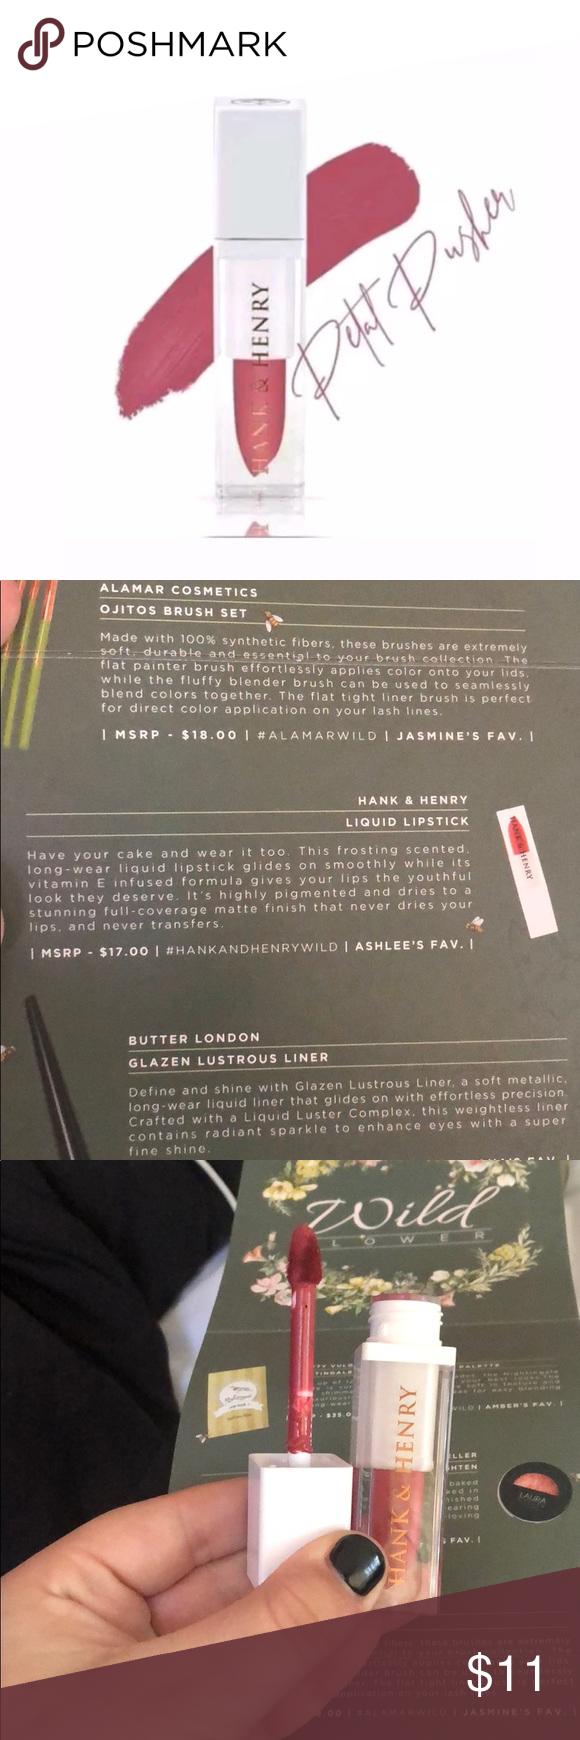 hank & henry liquid lipstick NWT (With images) Lipstick